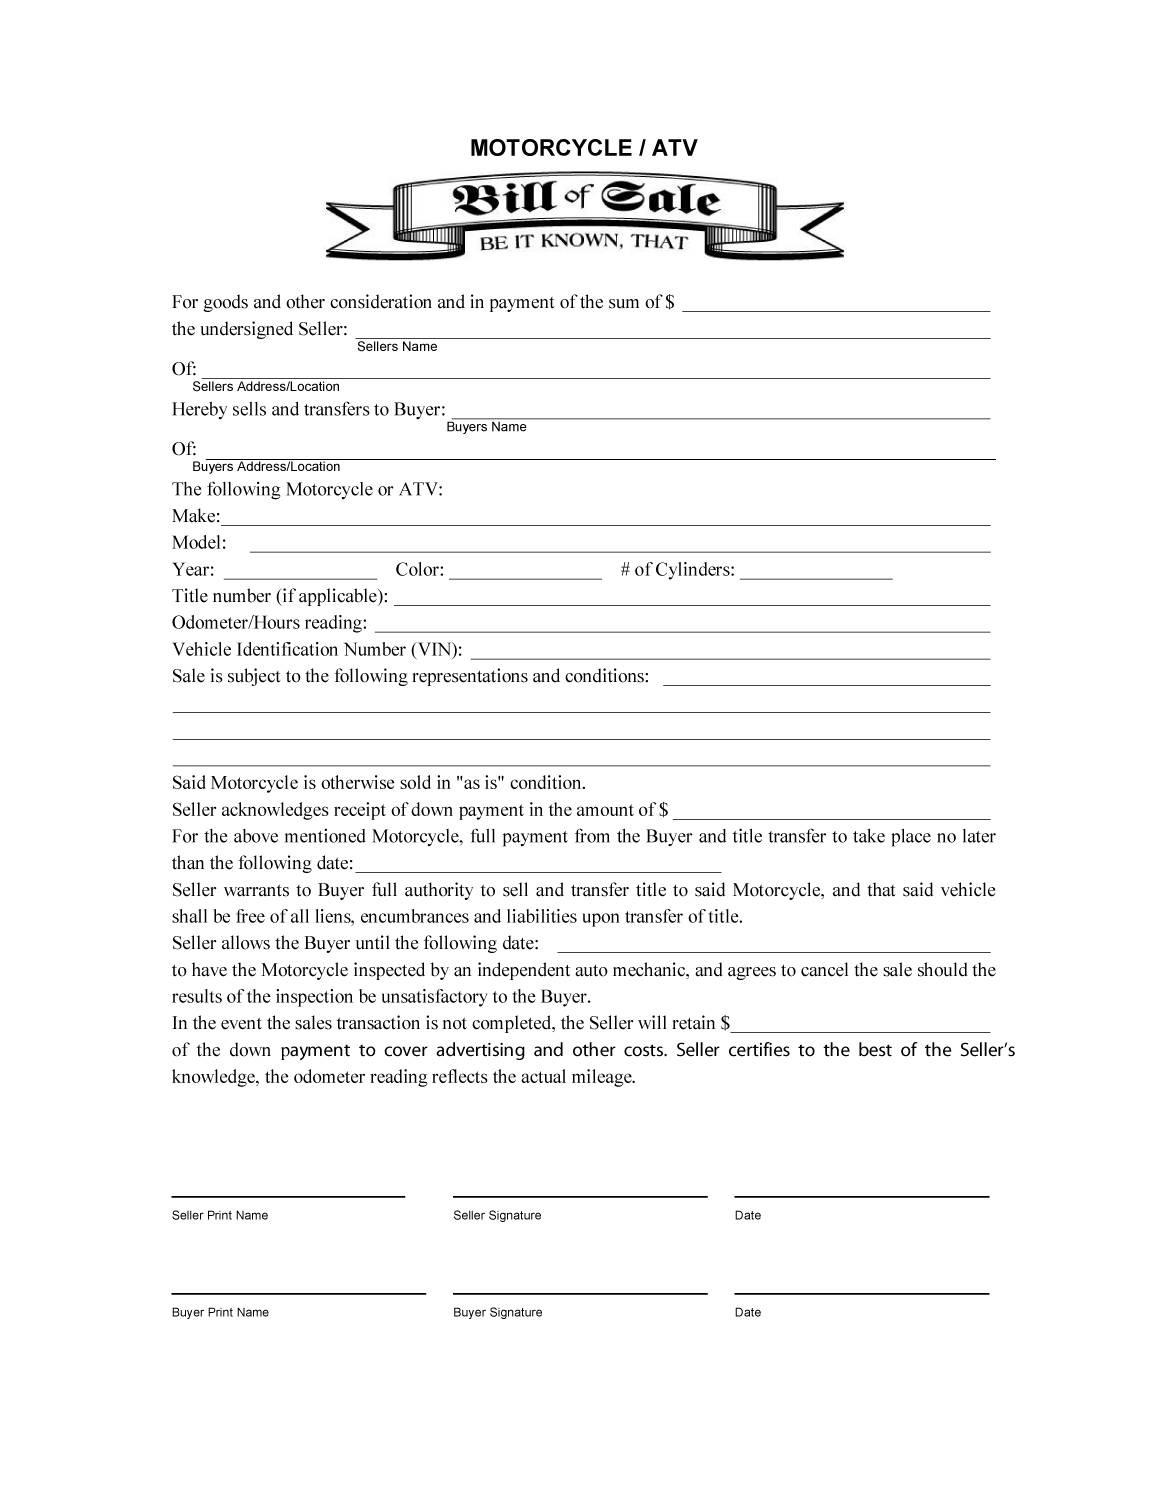 45+ Fee Printable Bill Of Sale Templates (Car, Boat, Gun, Vehicle - Free Printable Bill Of Sell